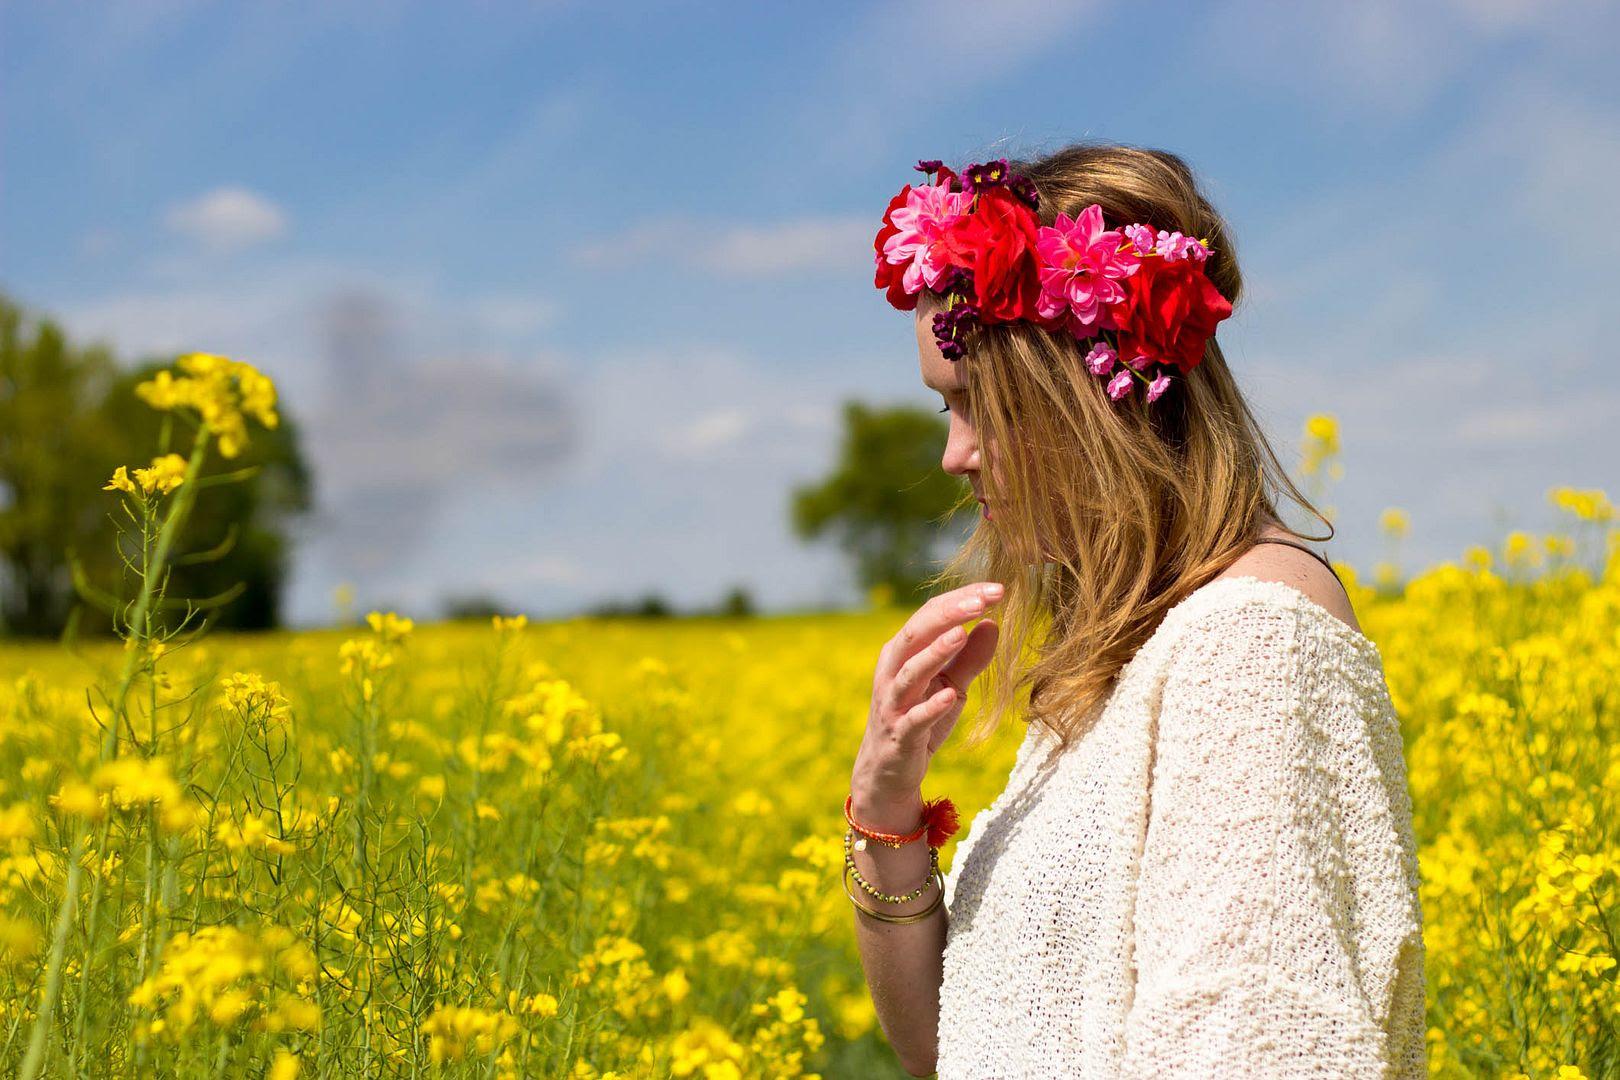 photo 13-champs-colza-couronne-fleurs_zps52260add.jpg